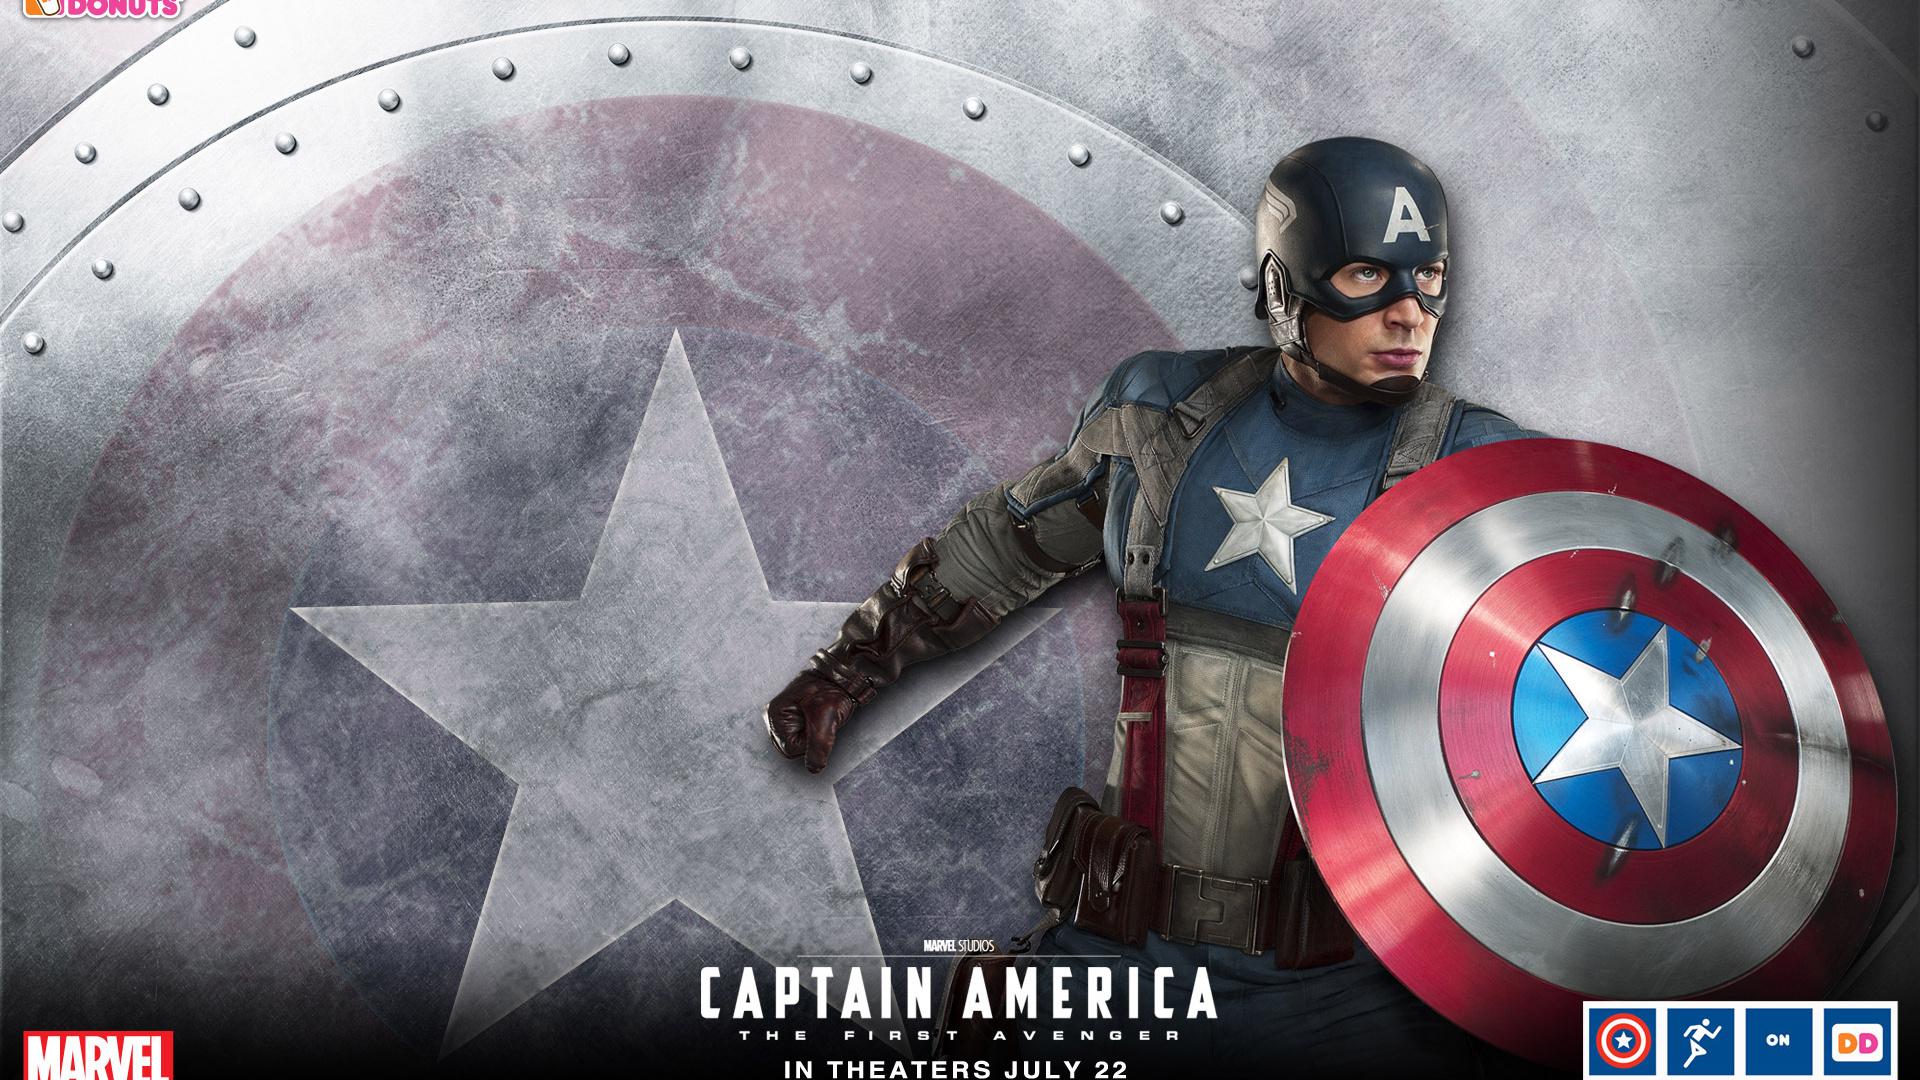 America Wallpaper HD movie superhero 4 Celebrity and Movie 1920x1080